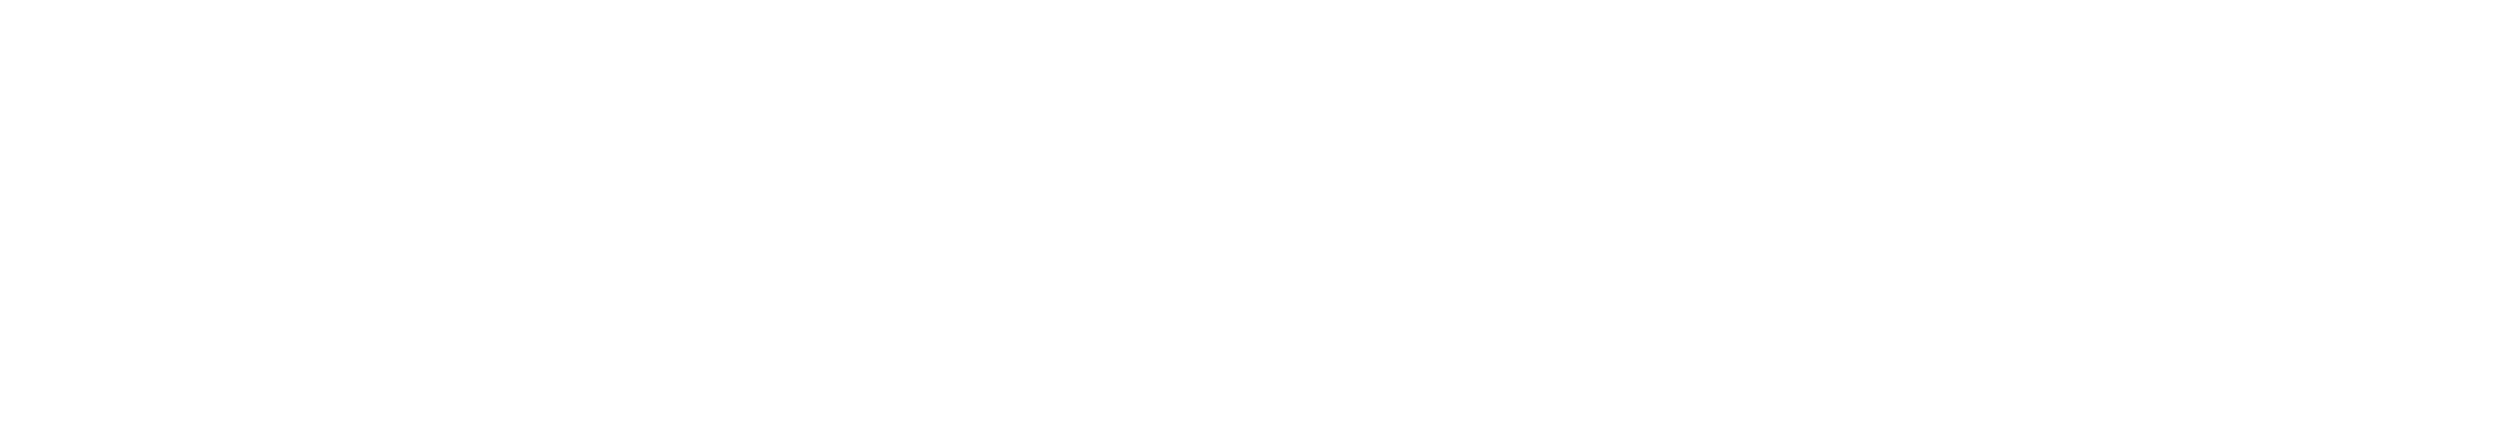 Client logos4-01.png